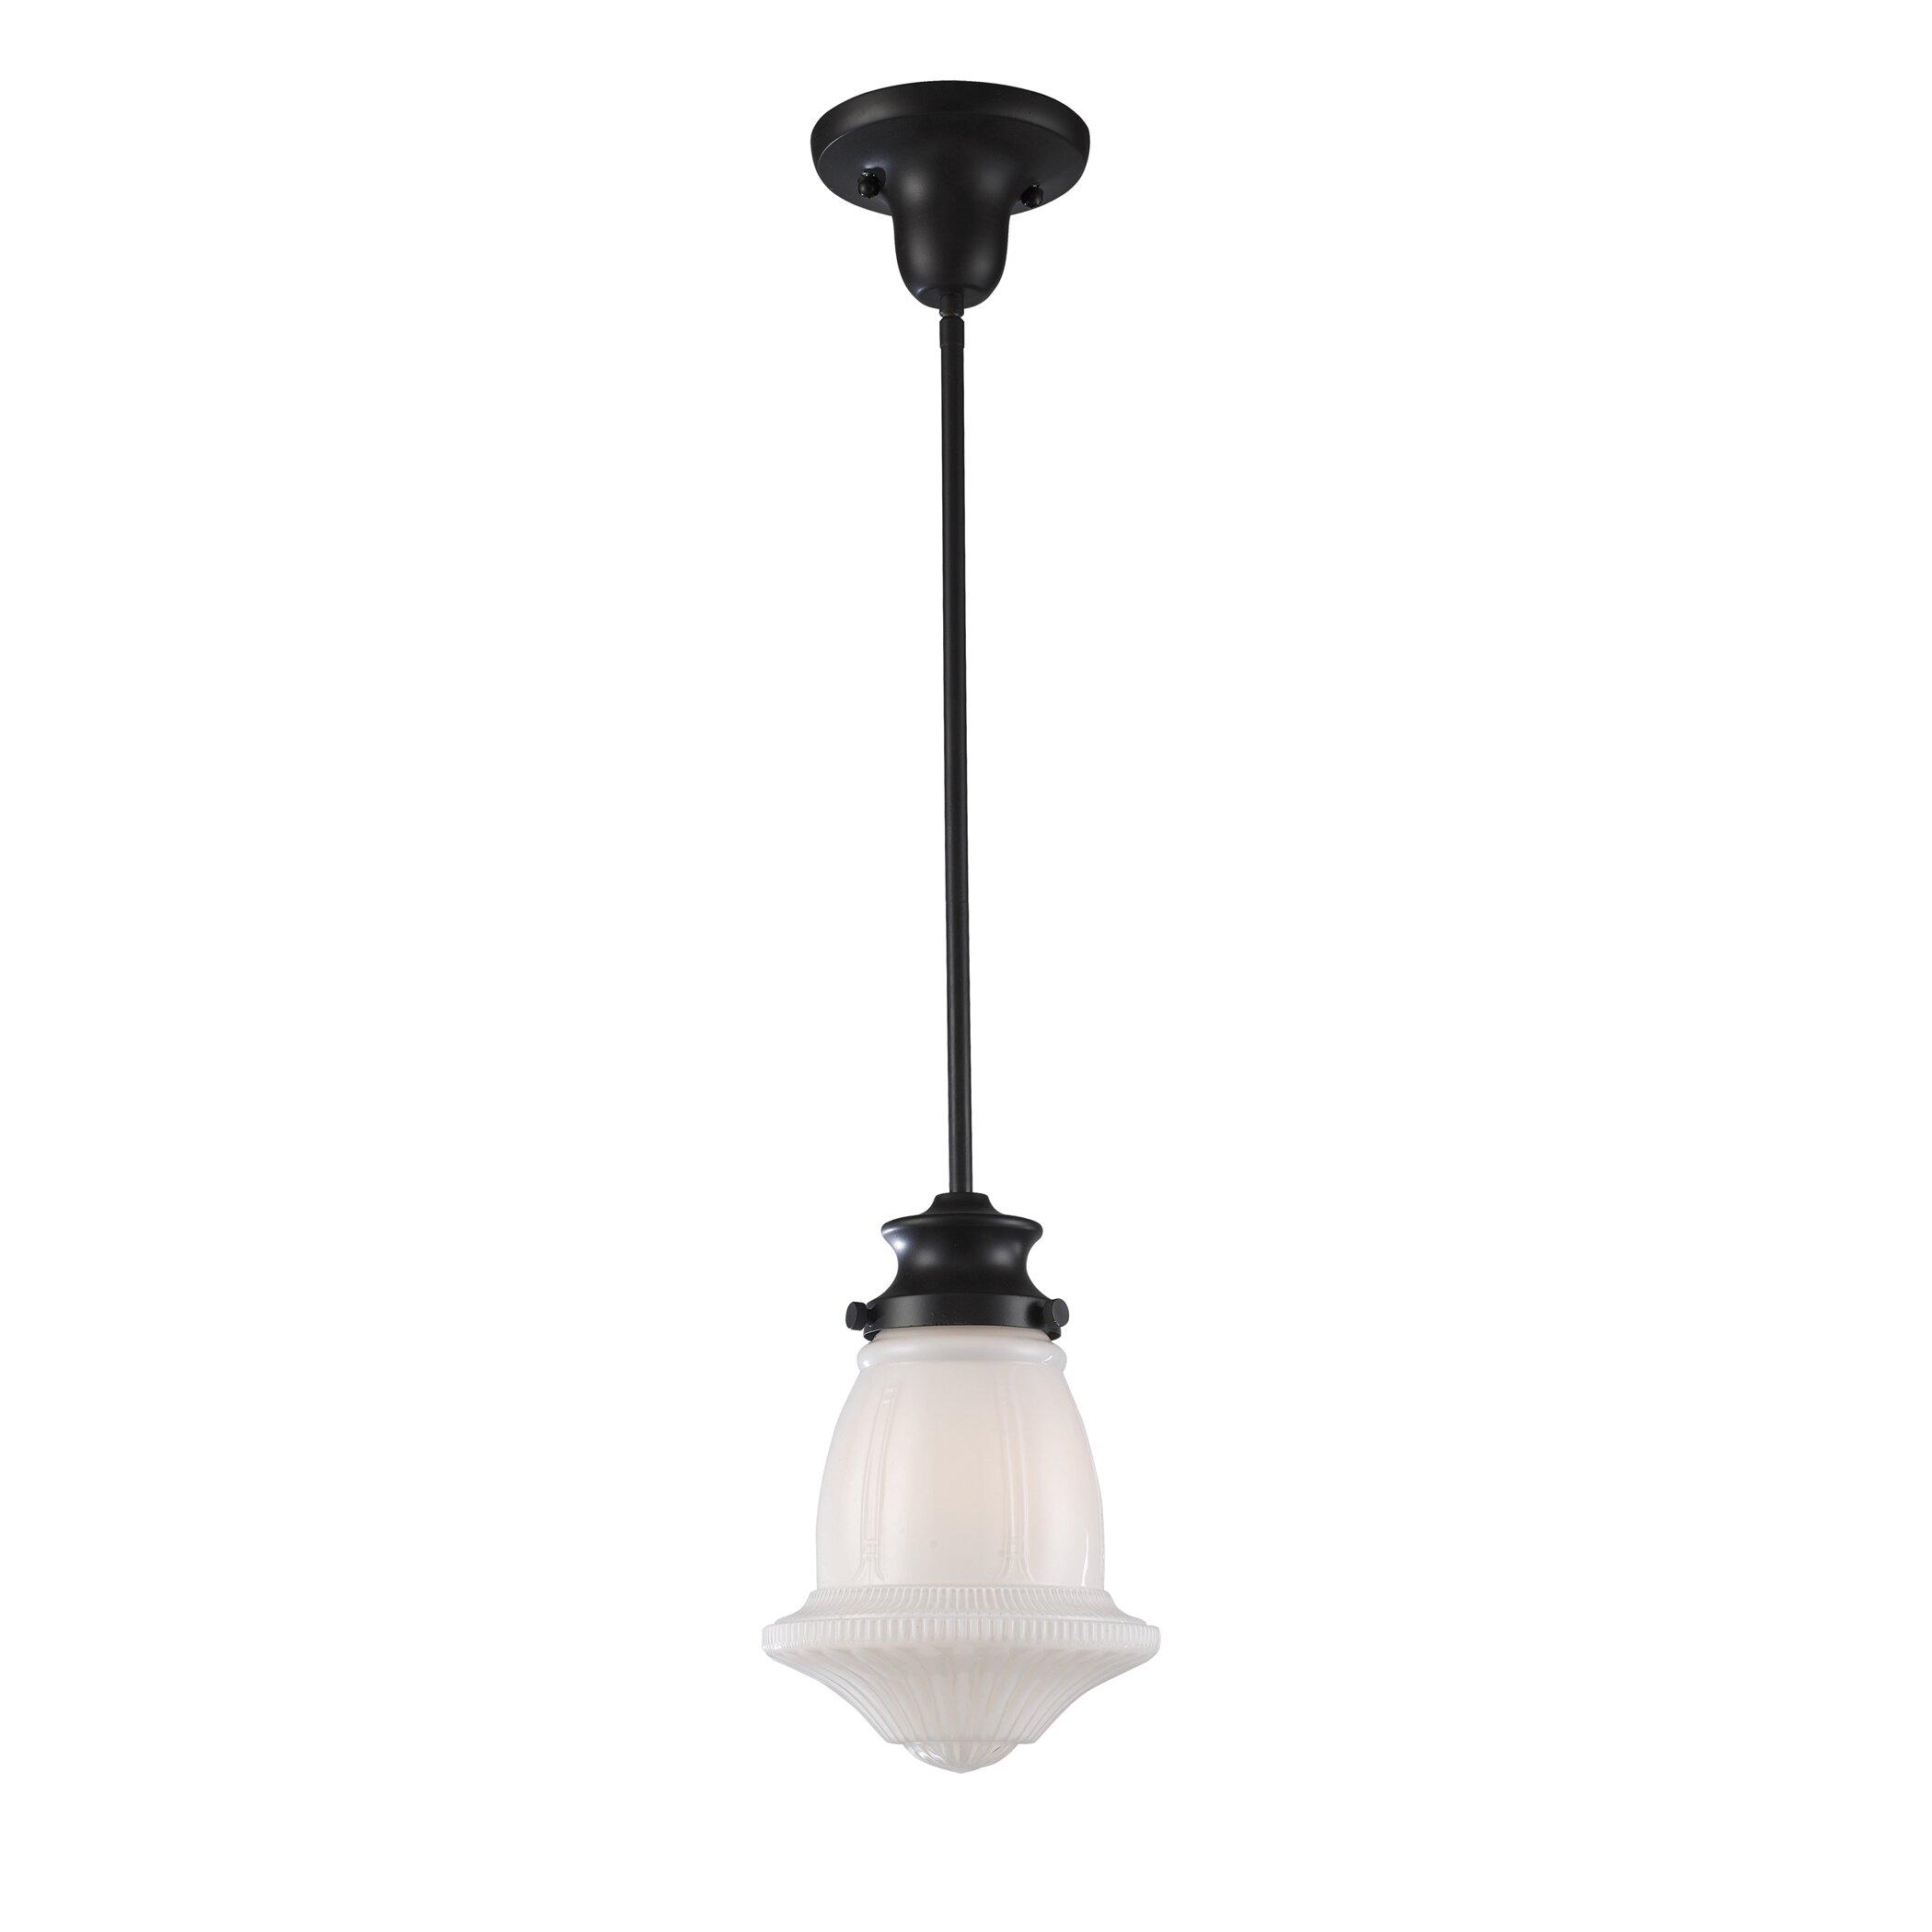 sc 1 th 225 & Schoolhouse Pendant Lighting azcodes.com